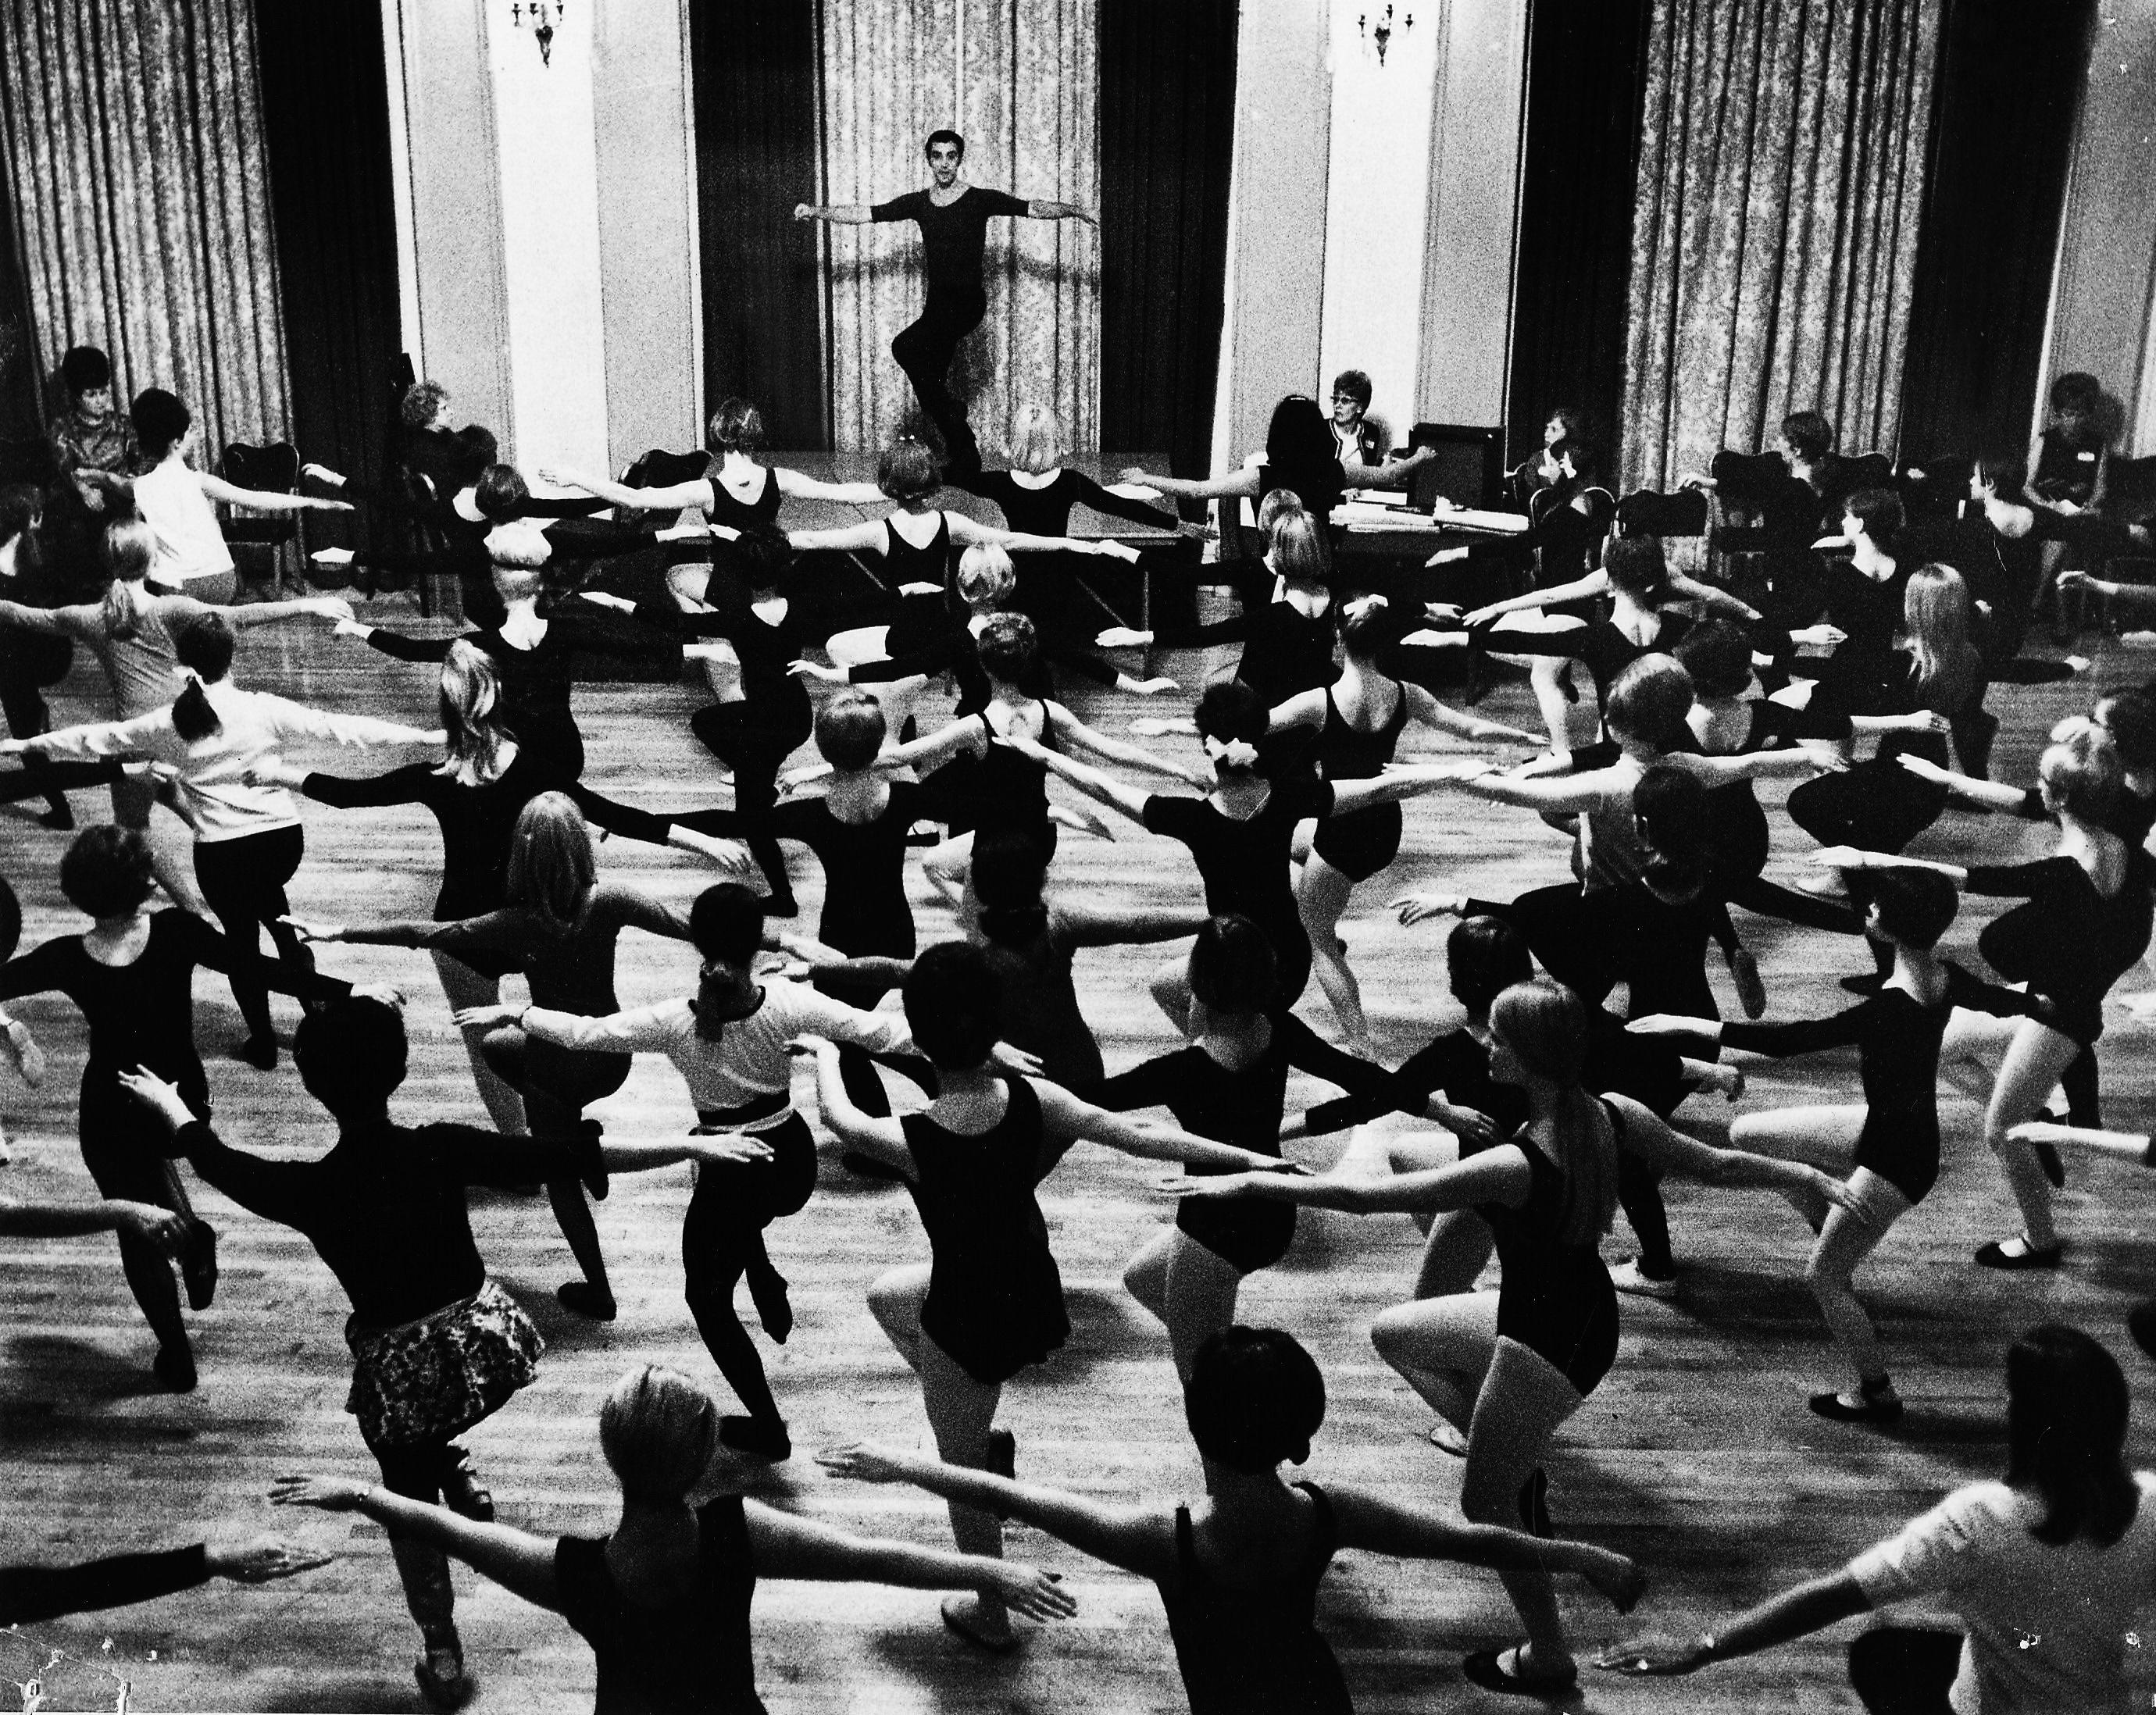 Master Teacher Gus Giordano Photo Jazz Dance Dance